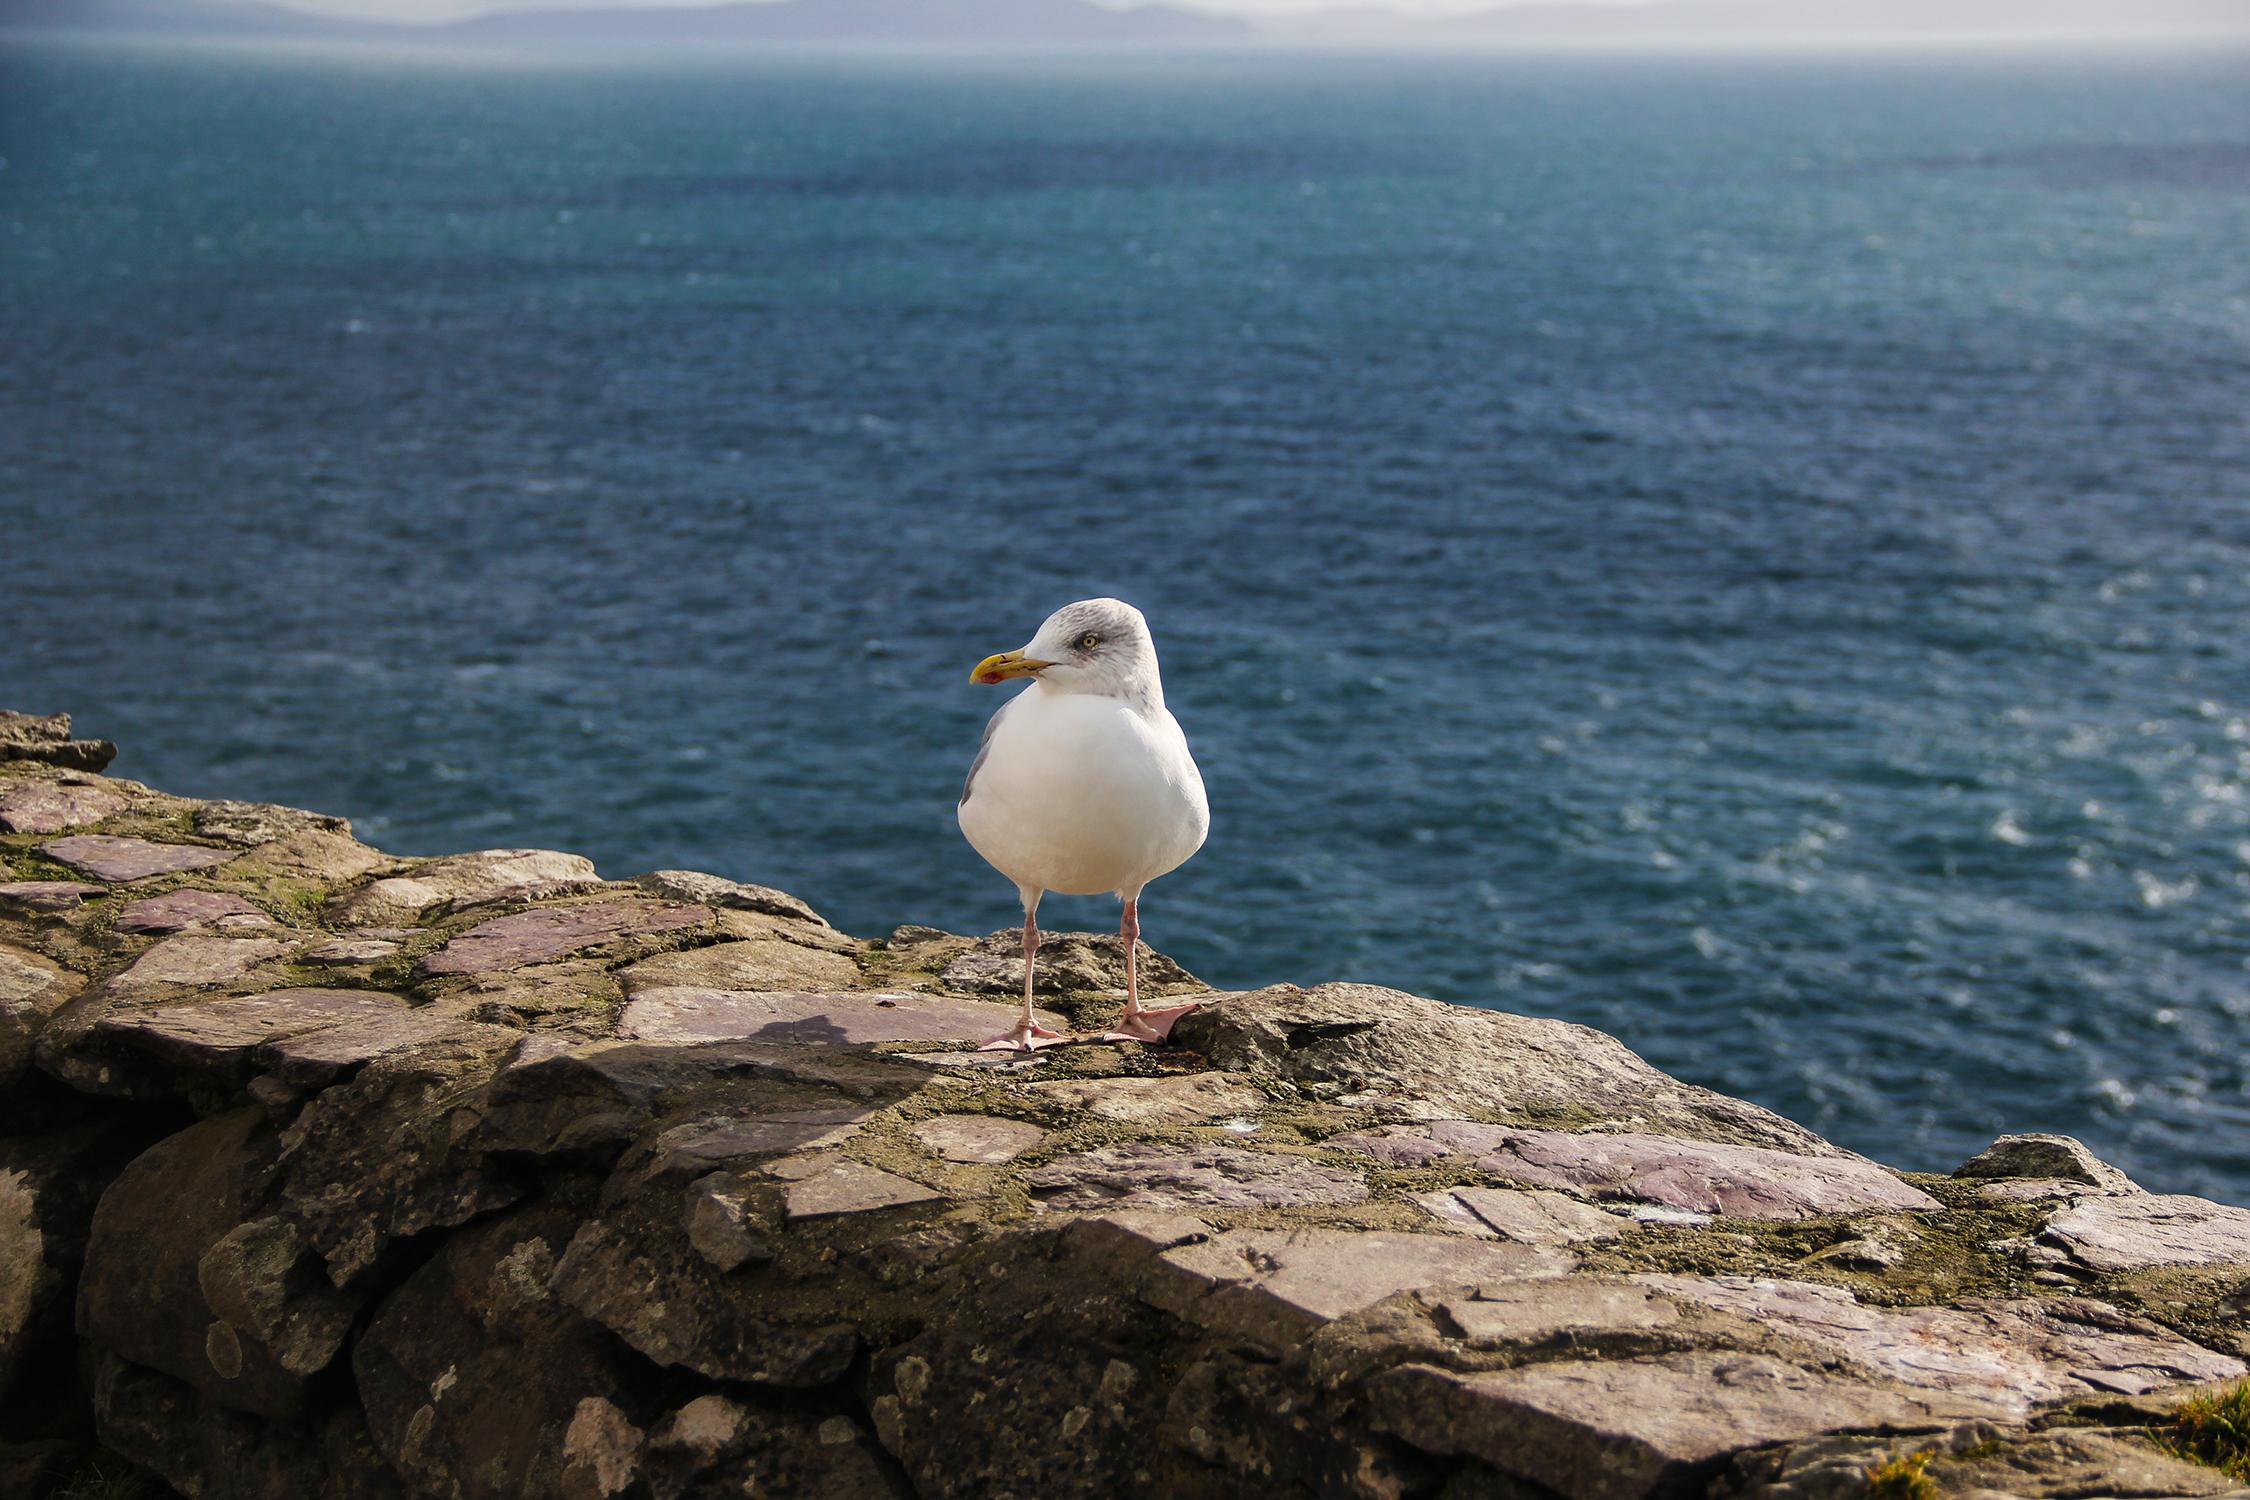 Sea gull sitting on rock wall, Ireland | St. Louis Photos